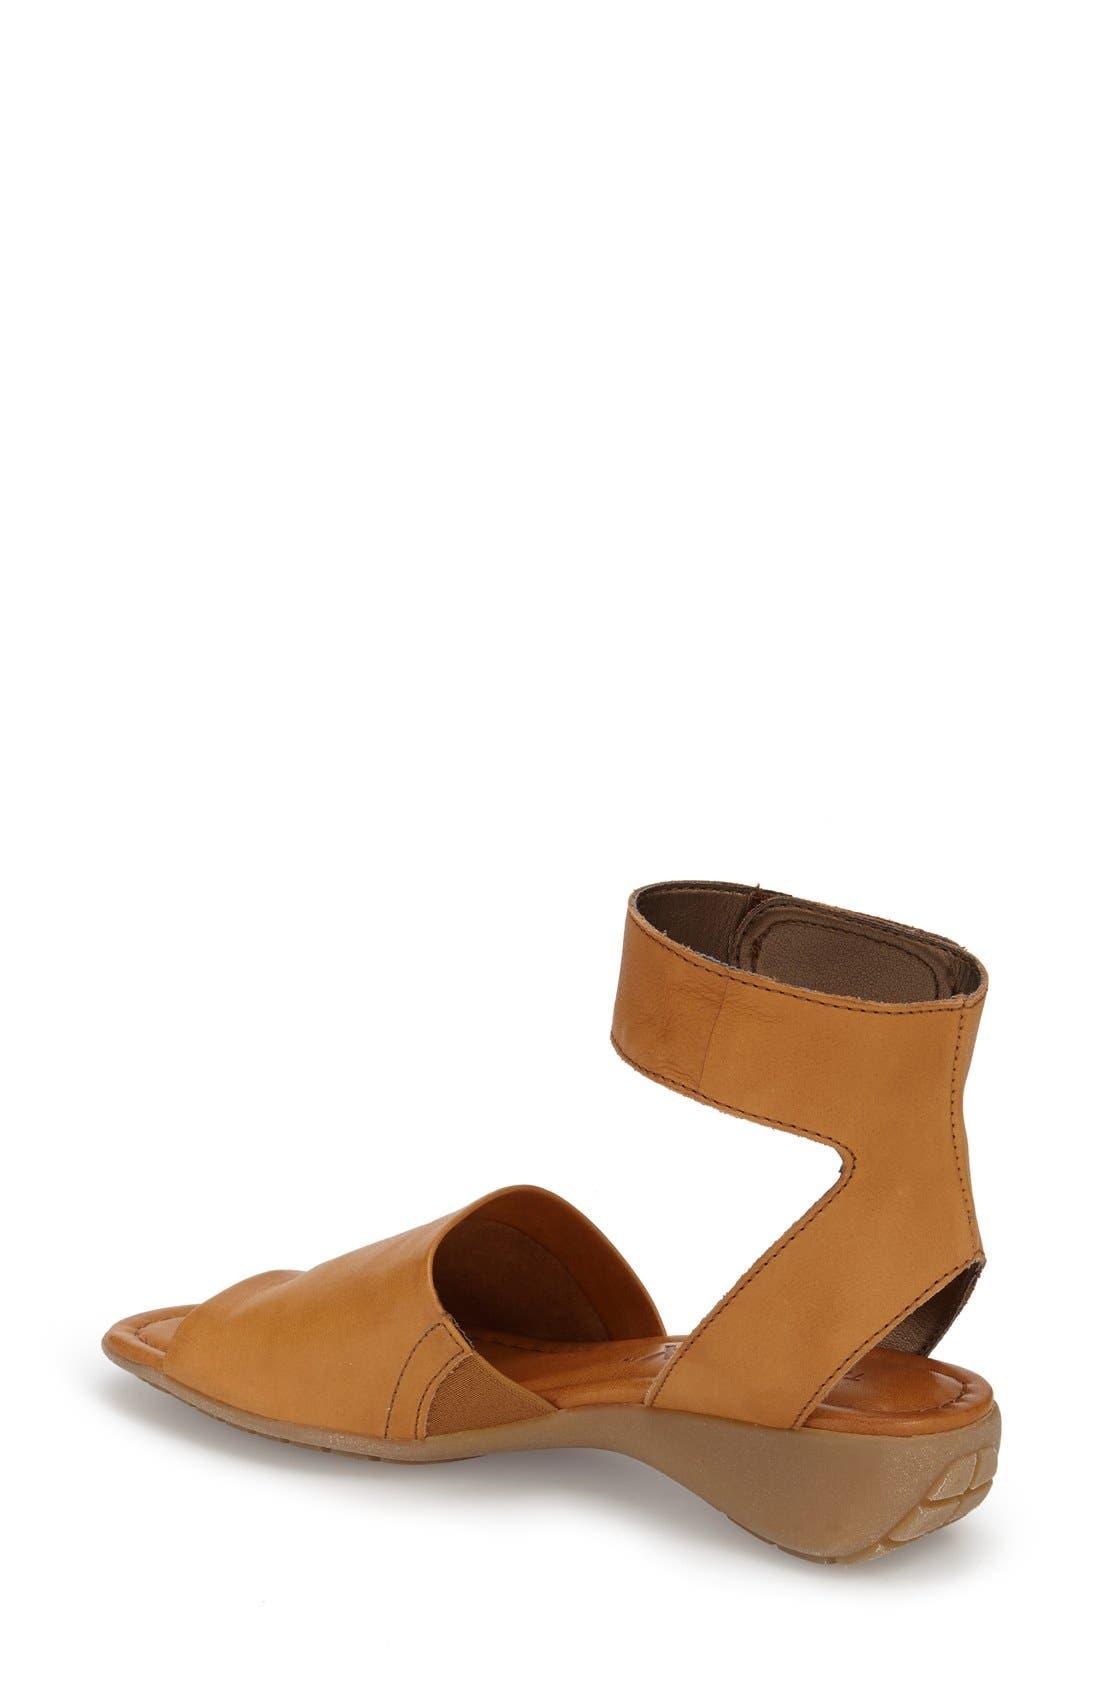 'Beglad' Leather Ankle Strap Sandal,                             Alternate thumbnail 2, color,                             Virginia Brown Leather